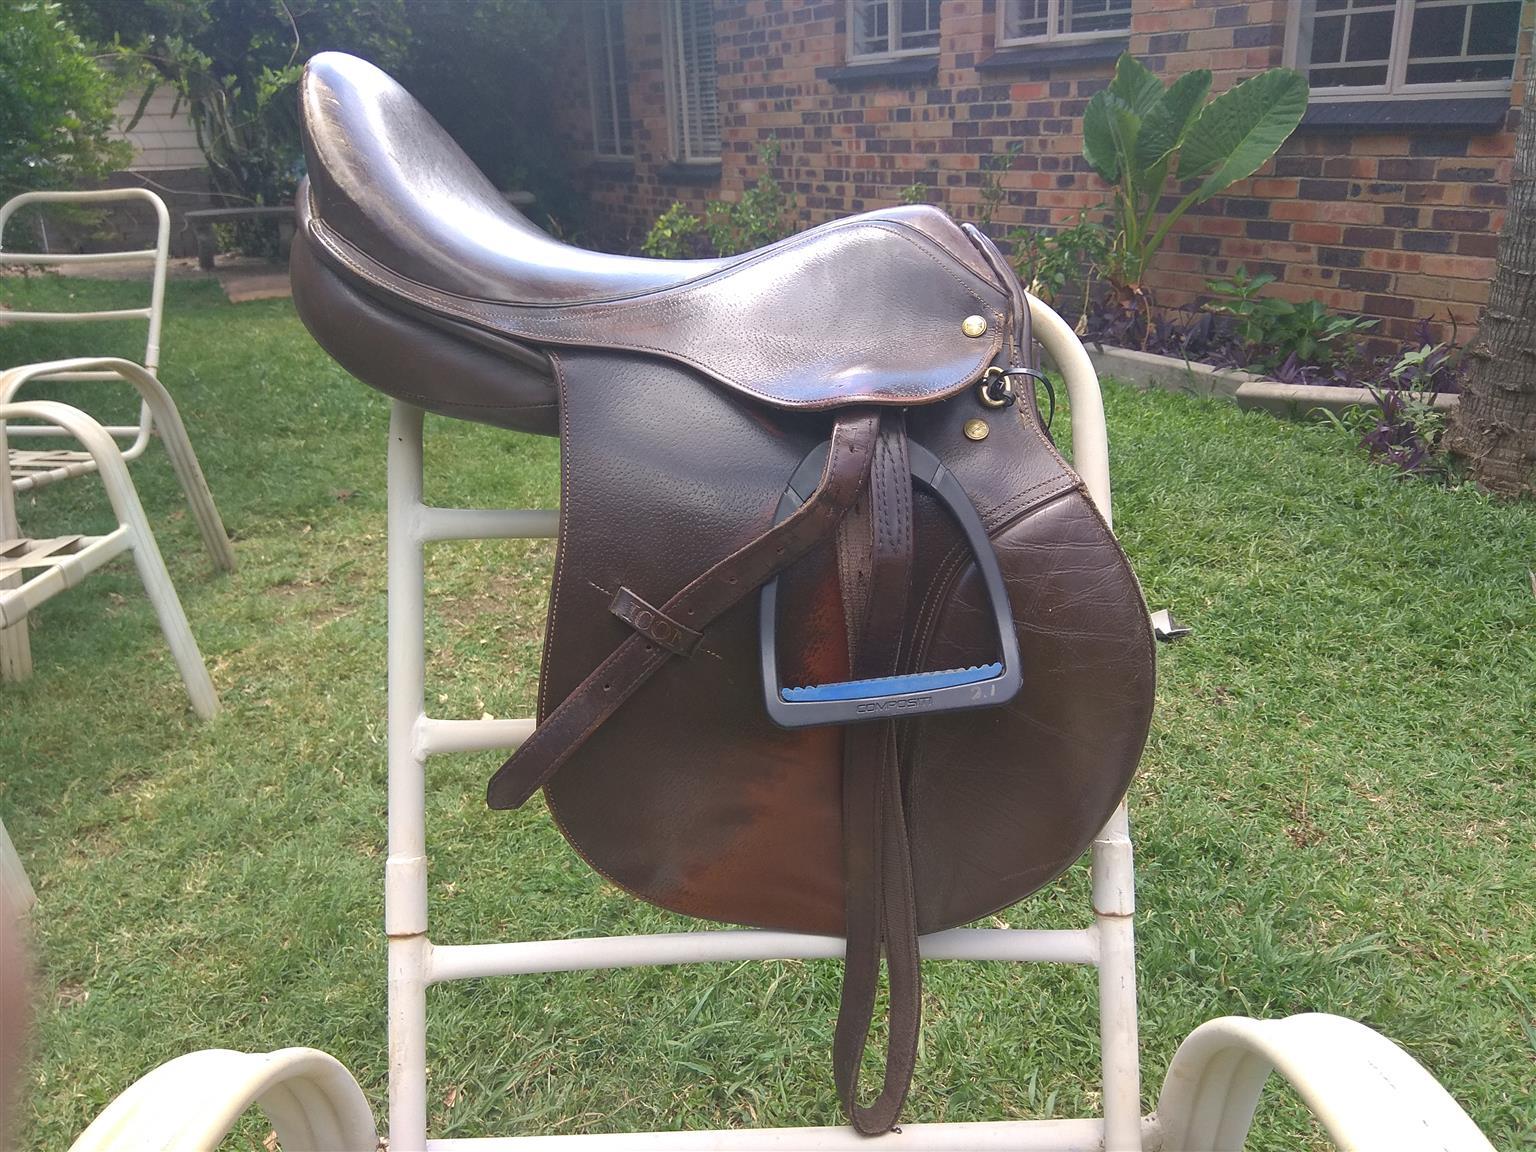 Saddles forsale *URGENT*